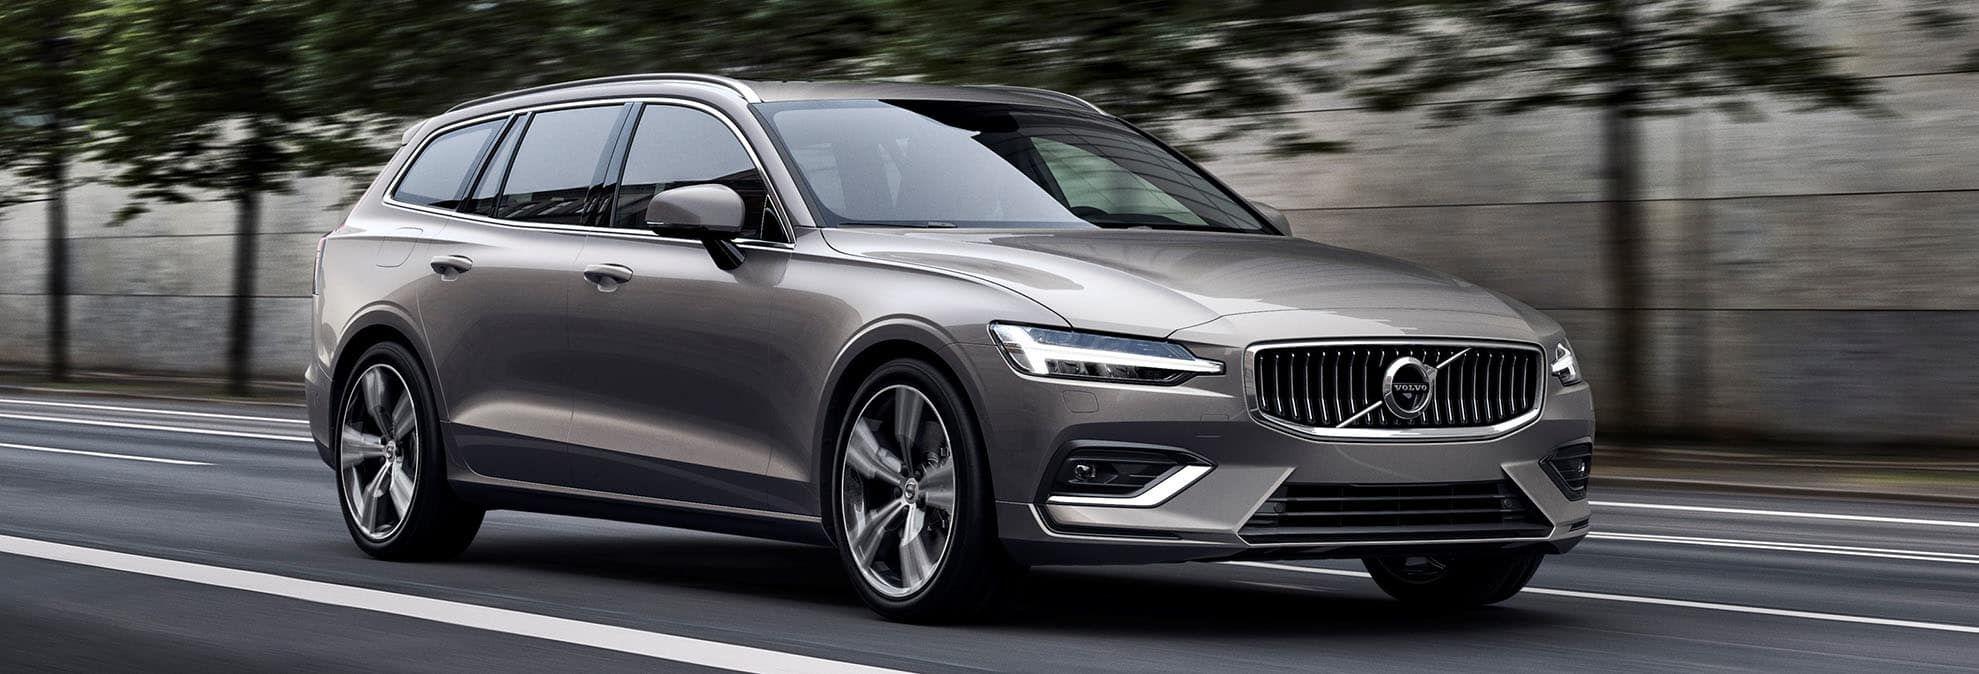 2019 Volvo V60 Wagon Delivers Style and Safety Volvo v60